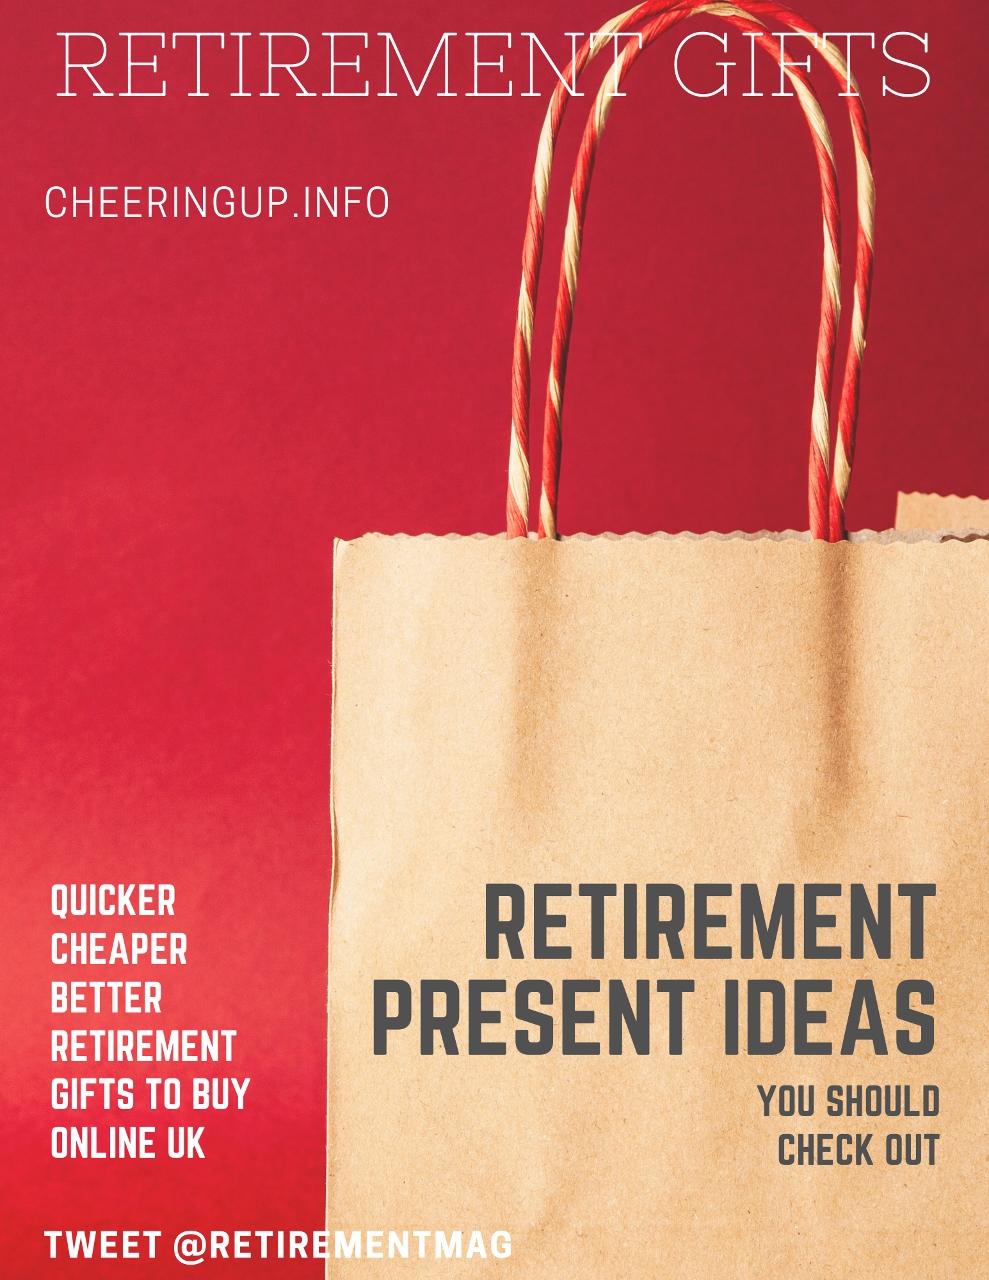 Retirement Present Ideas UK